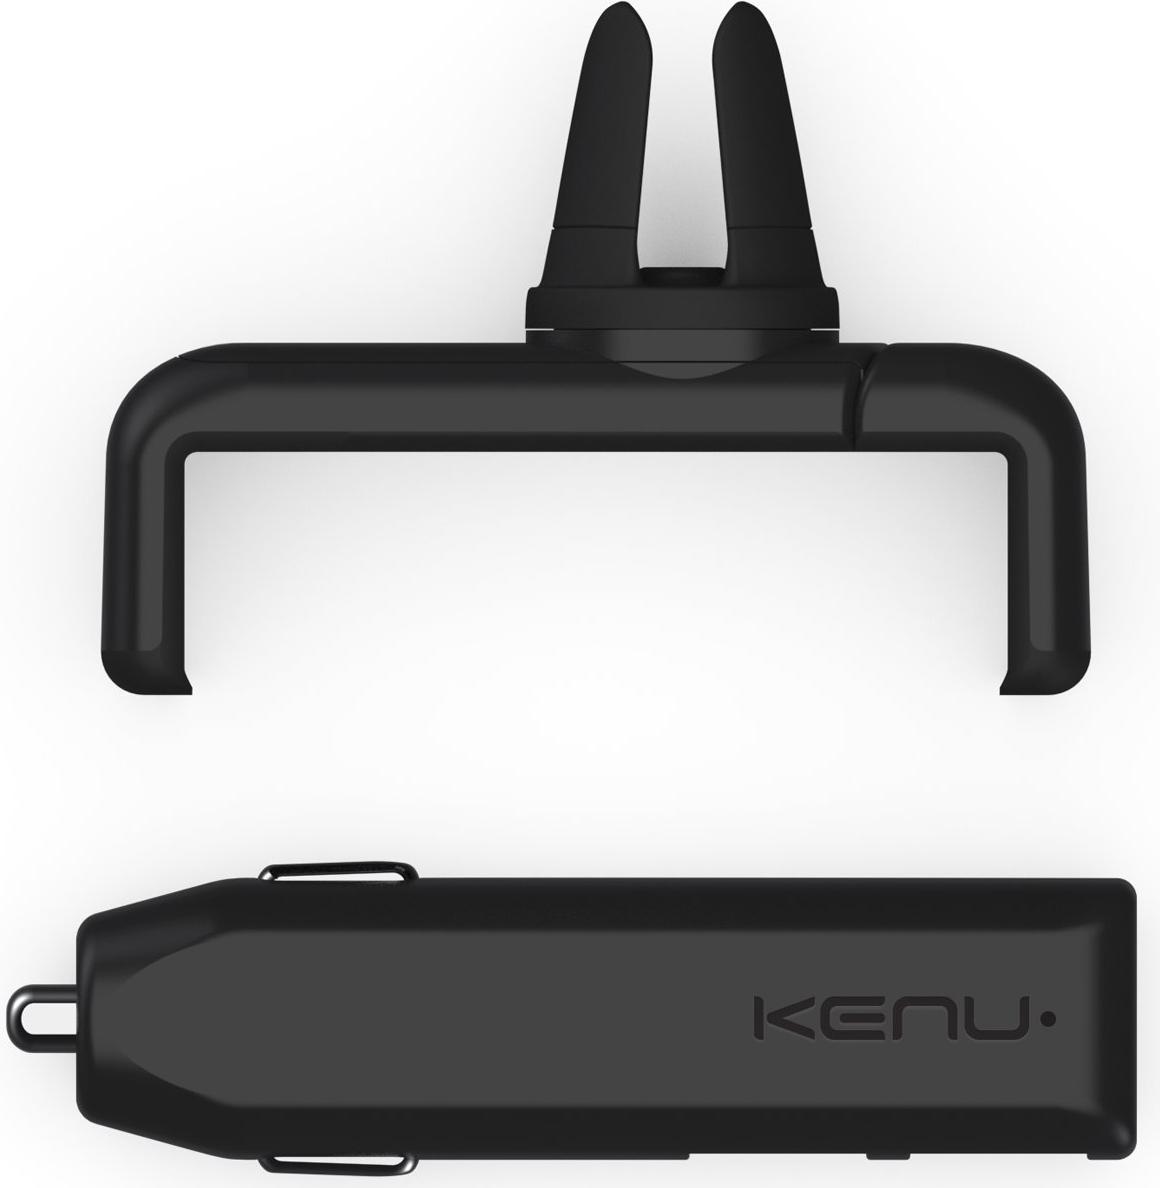 Комплект Kenu Airframe+ Car Kit Dual Trip автомобильное ЗУ + держатель (Black)